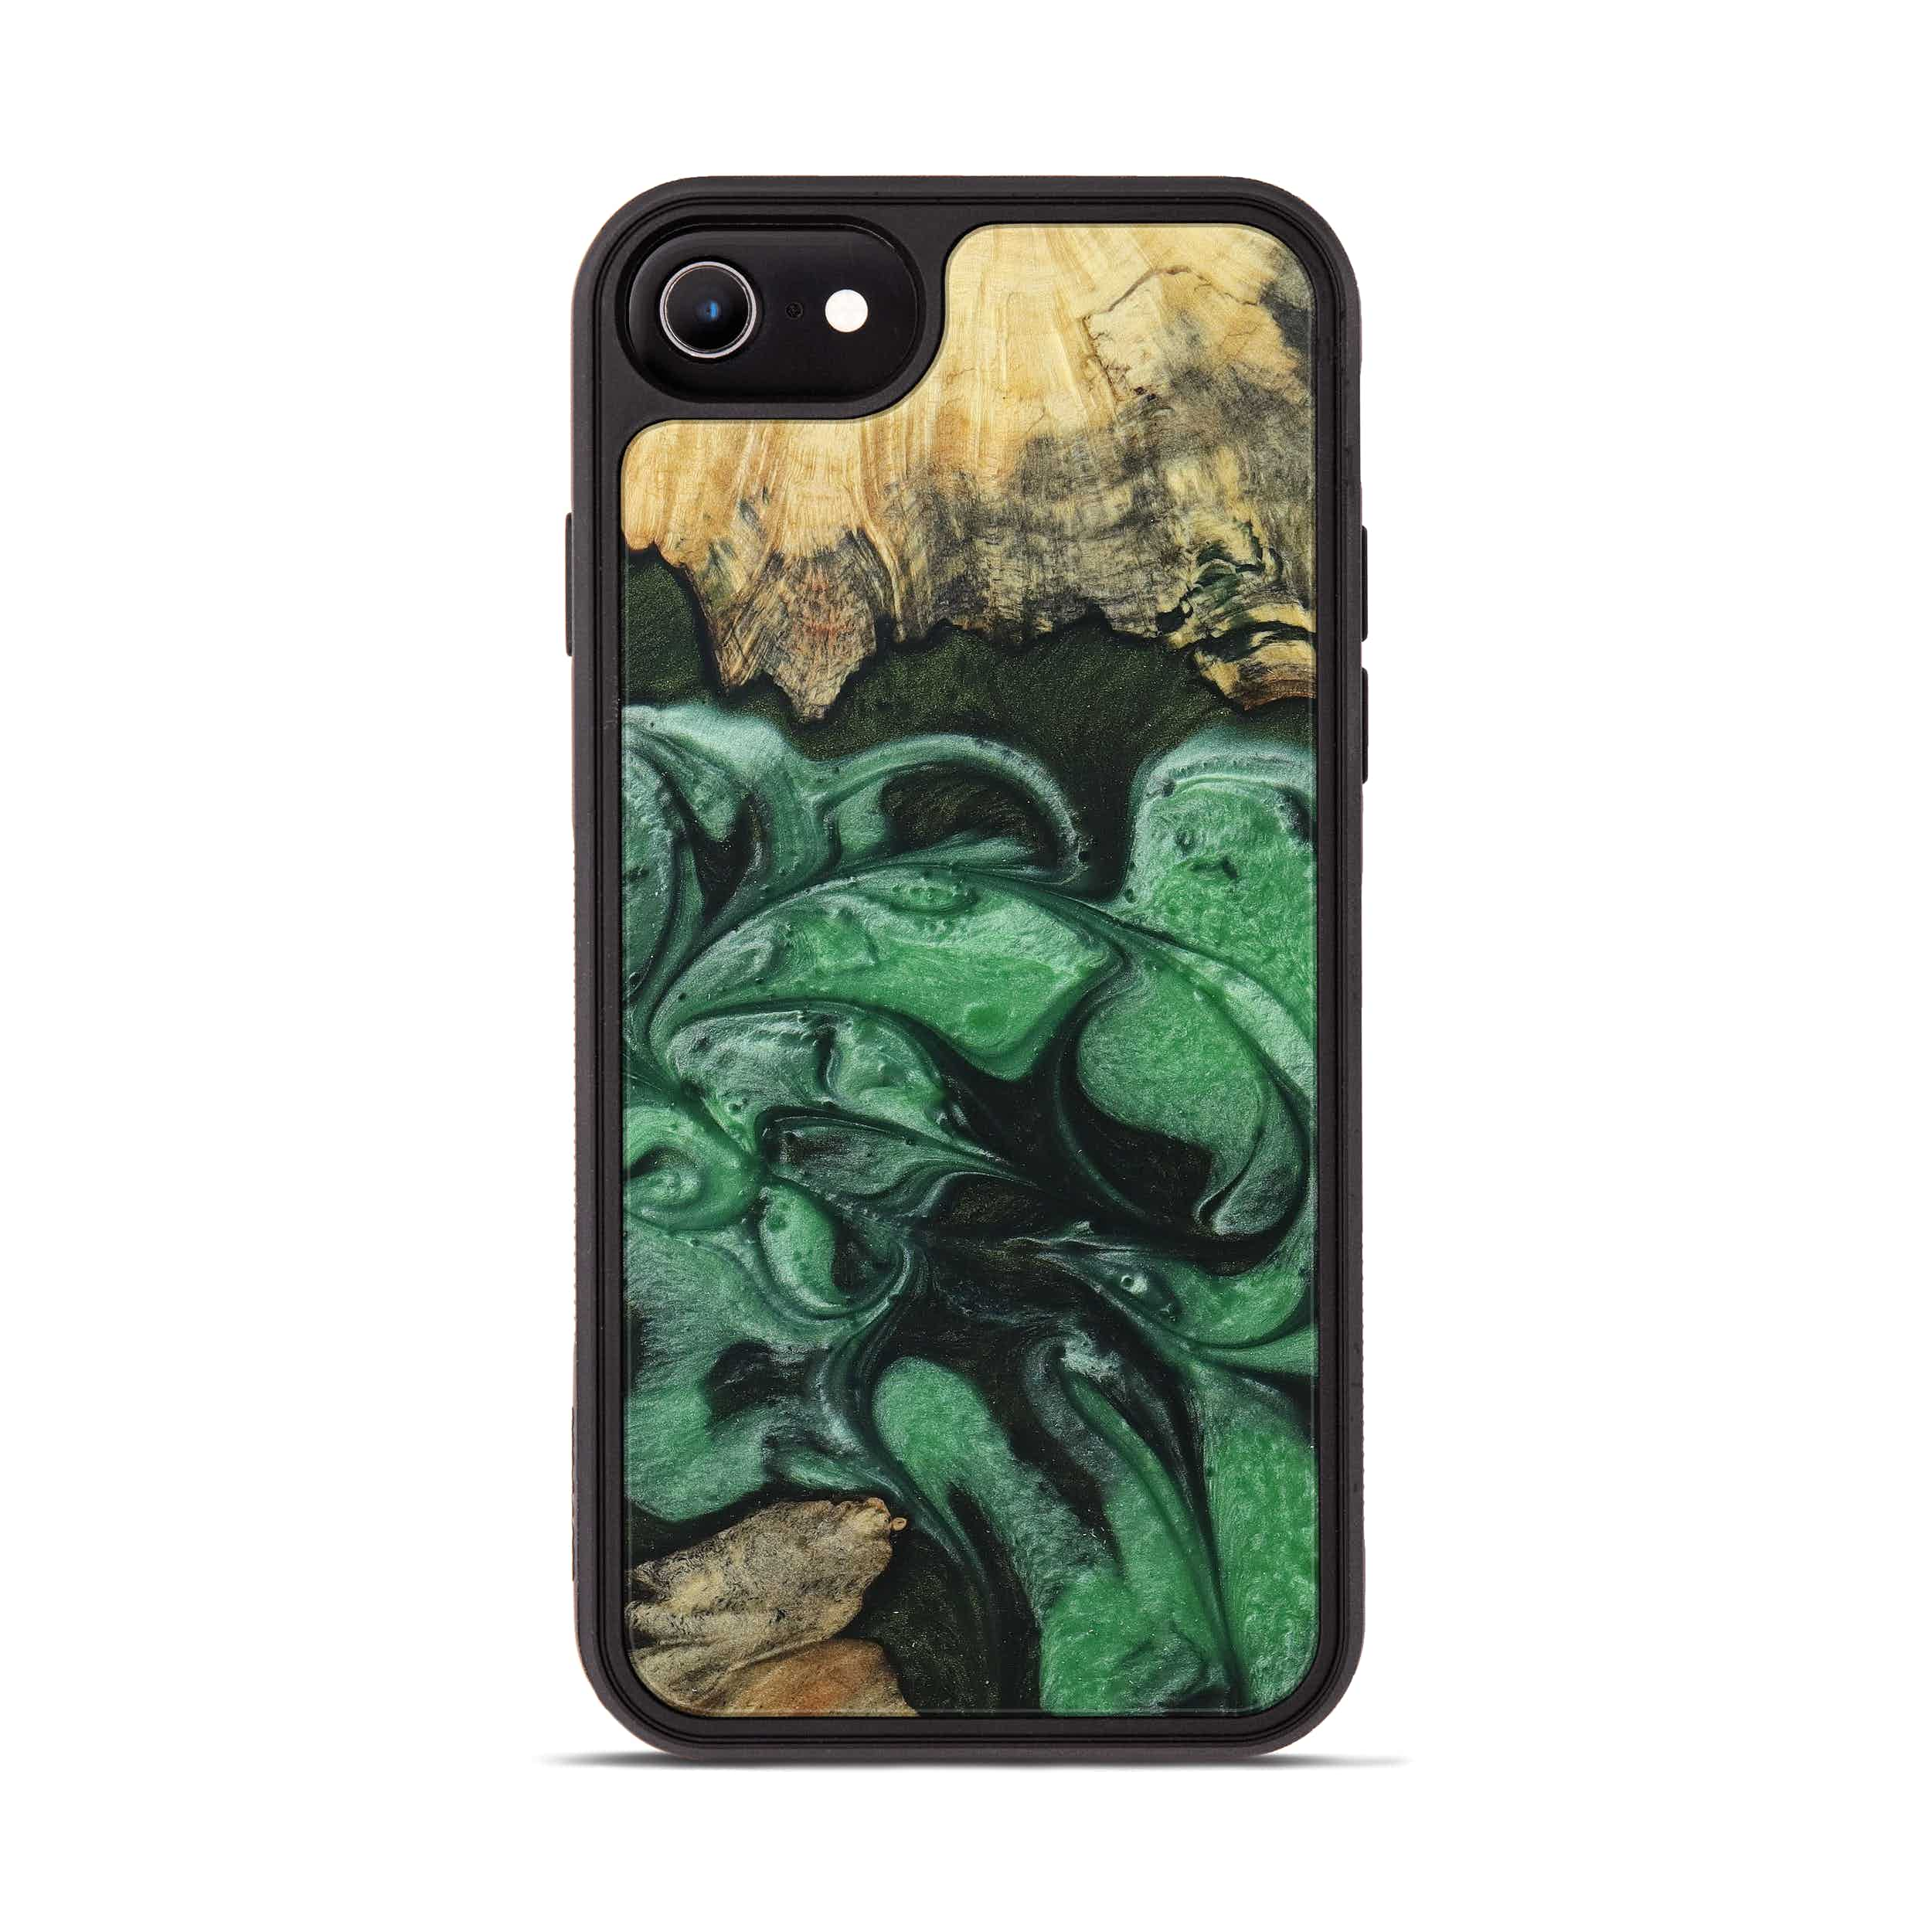 iPhone 6s Wood+Resin Phone Case - Margi (Dark Green, 394605)